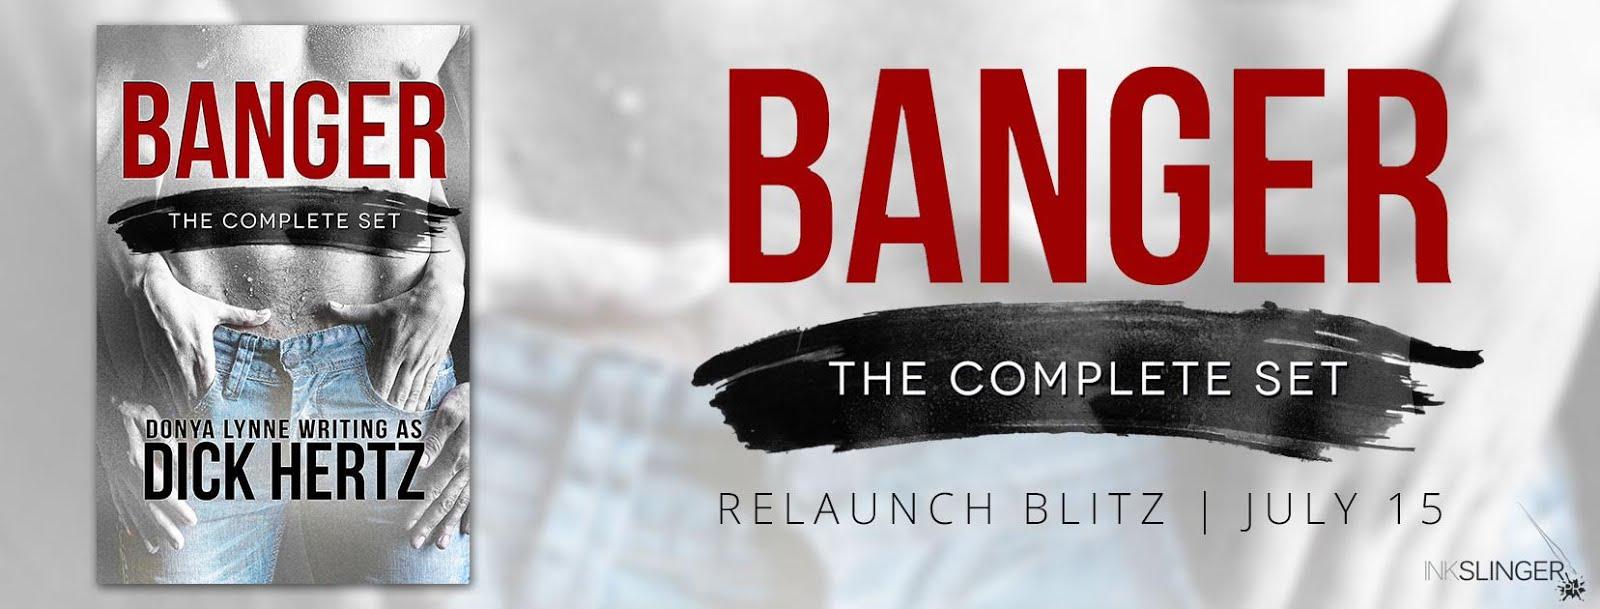 Banger Release Day Blitz Relaunch